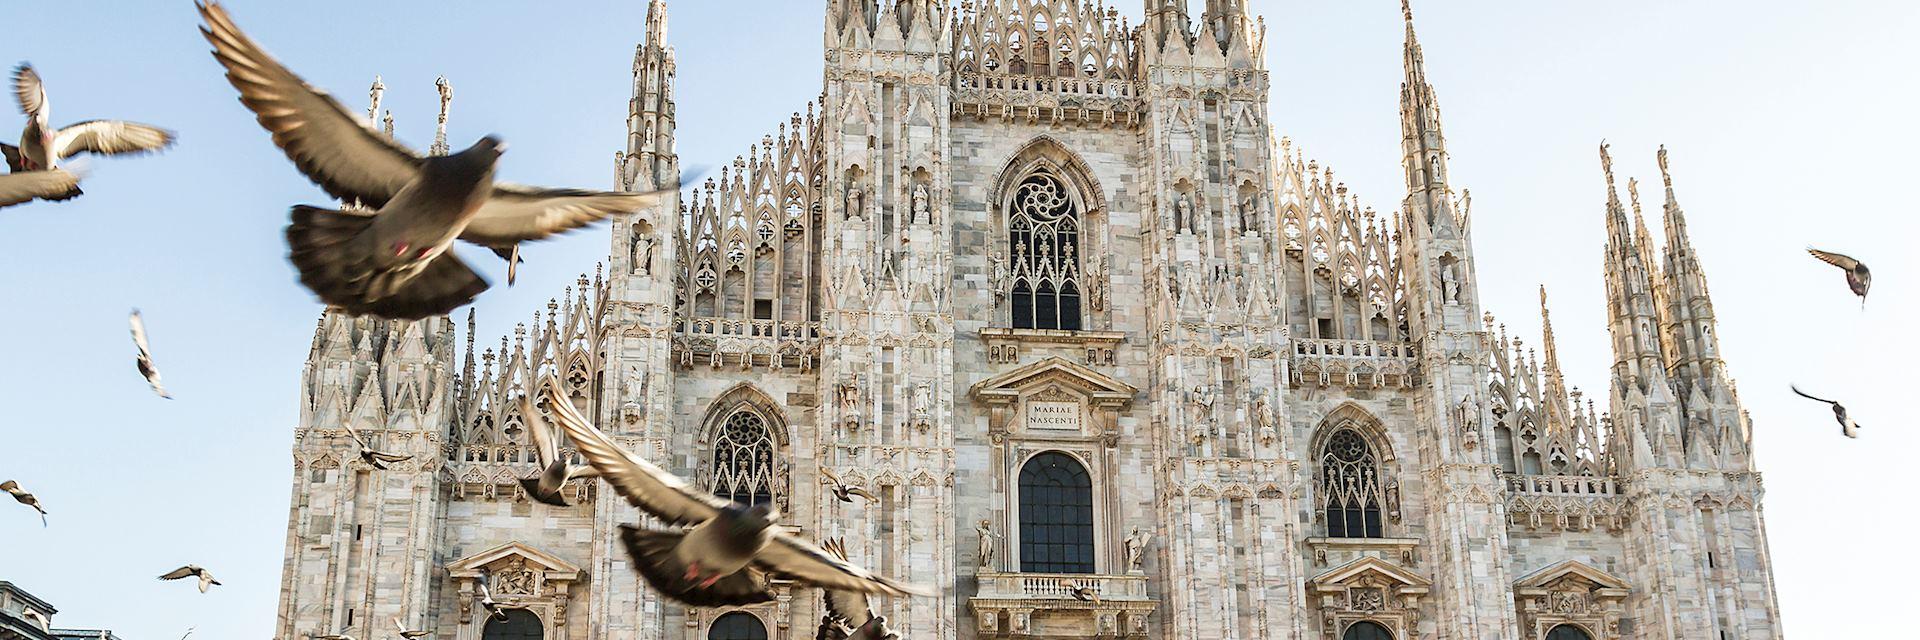 Duomo, Milan, Italy